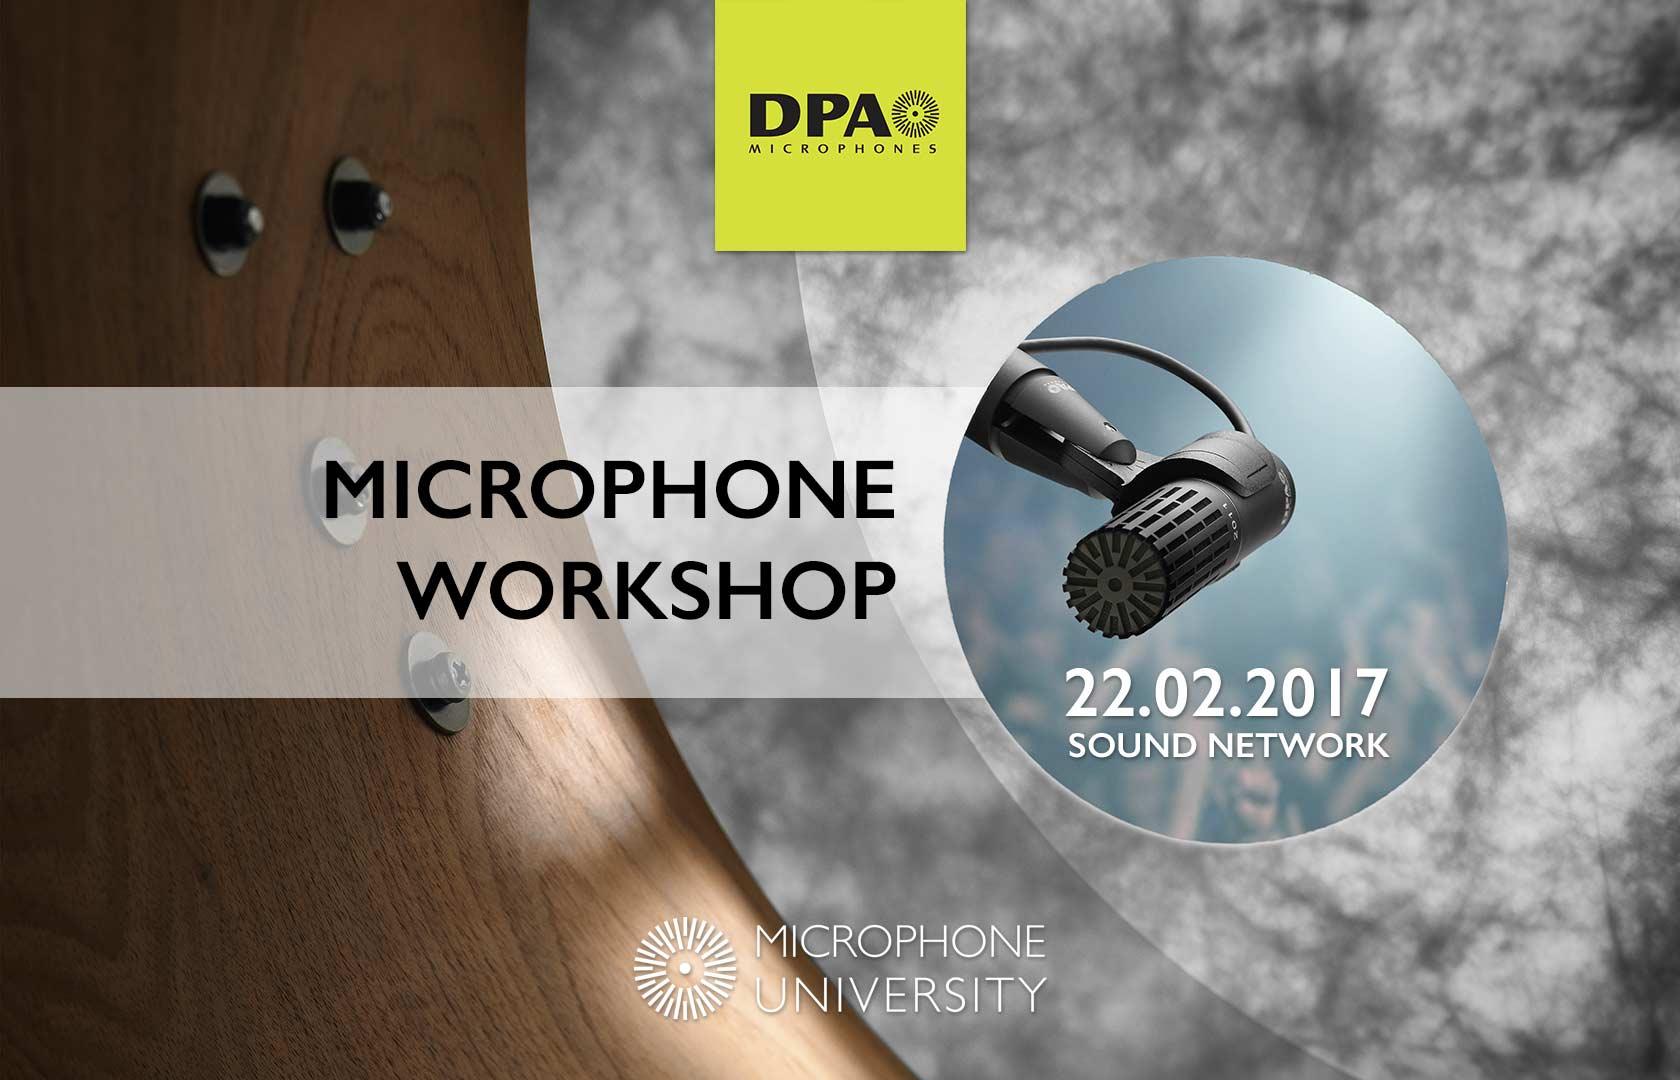 DPA mic University Workshop, Feb 2017